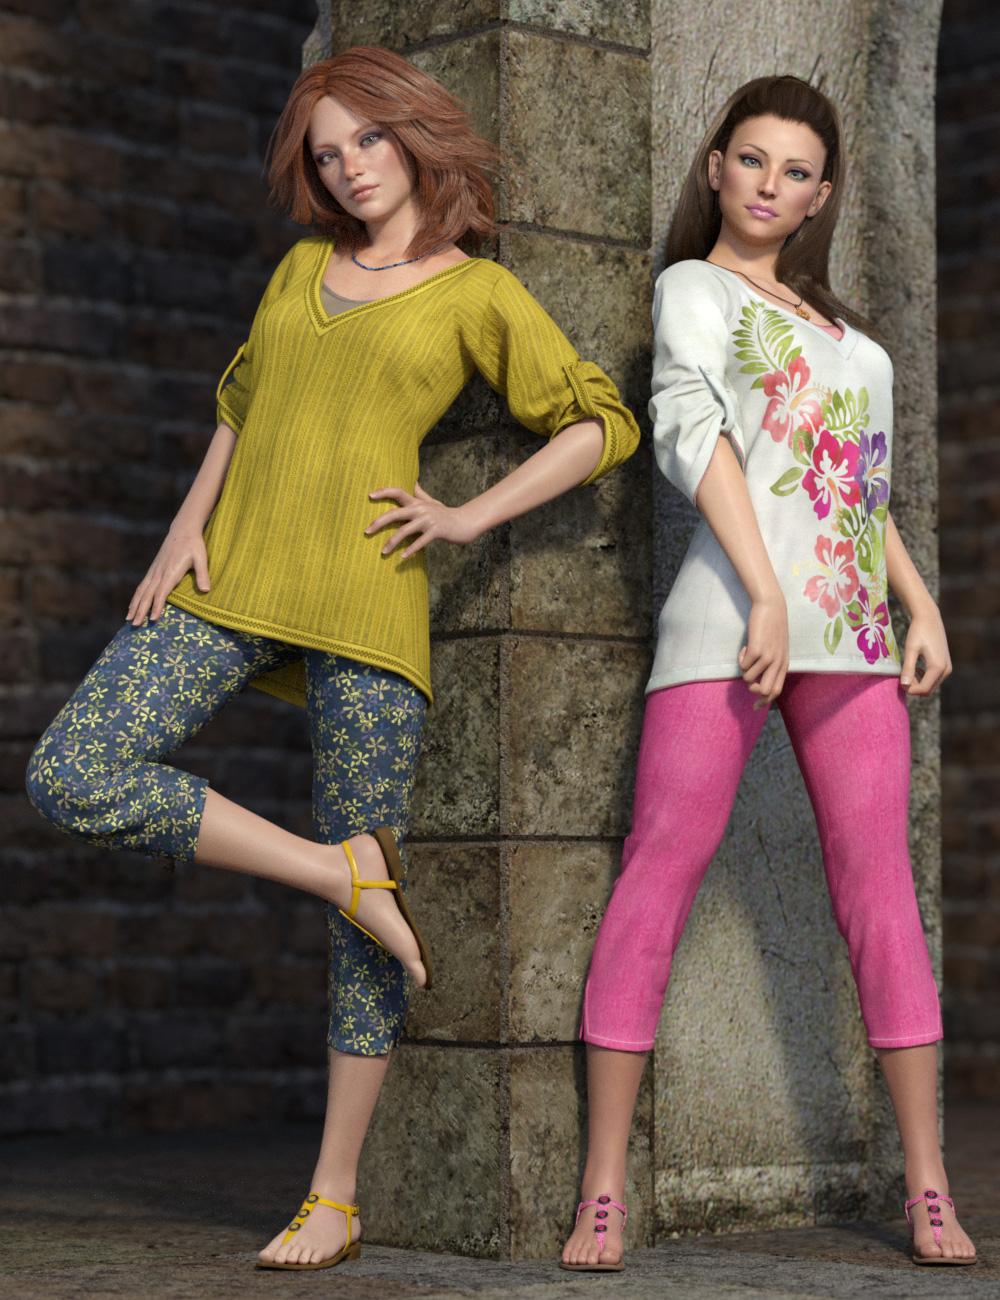 dForce Collection 01 Texture Expansion by: esha, 3D Models by Daz 3D